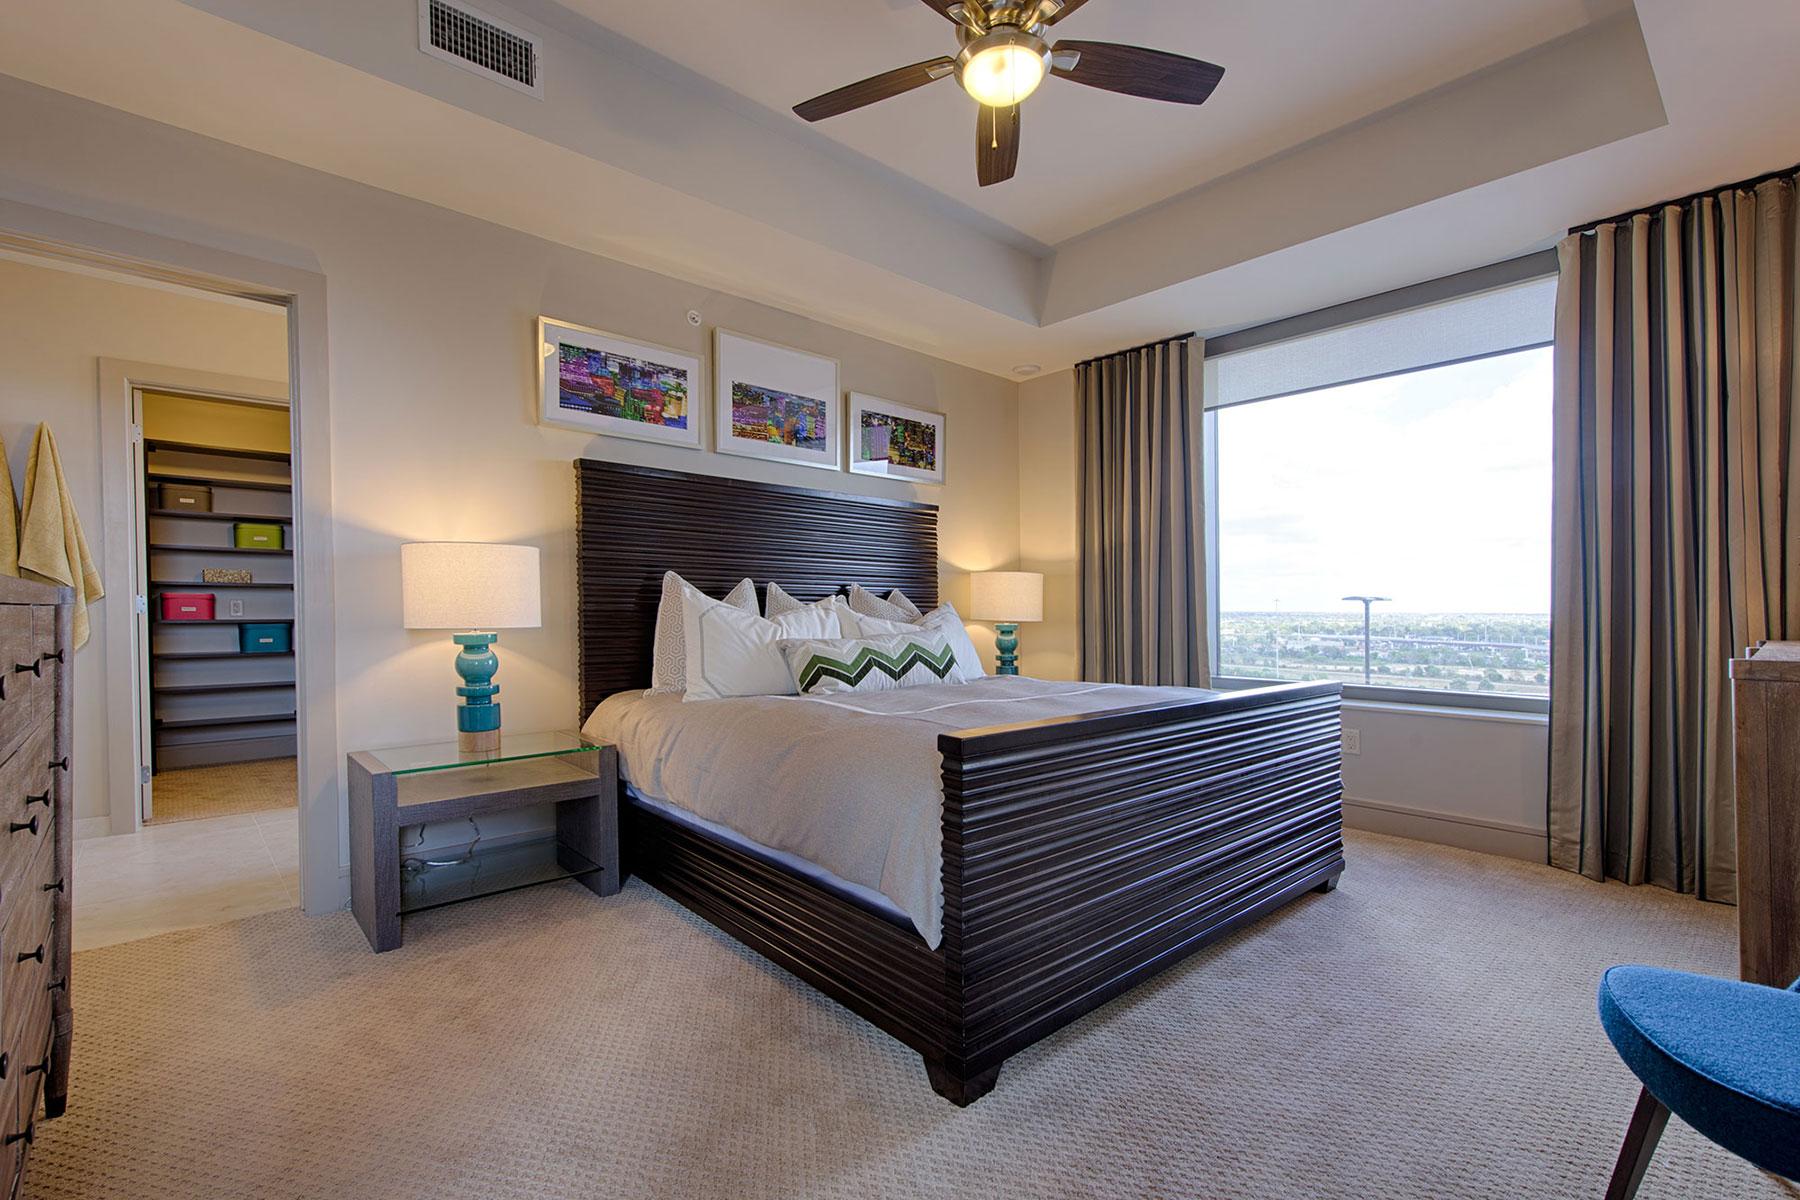 Master 2 Bedroom Luxury Modern Bedroom